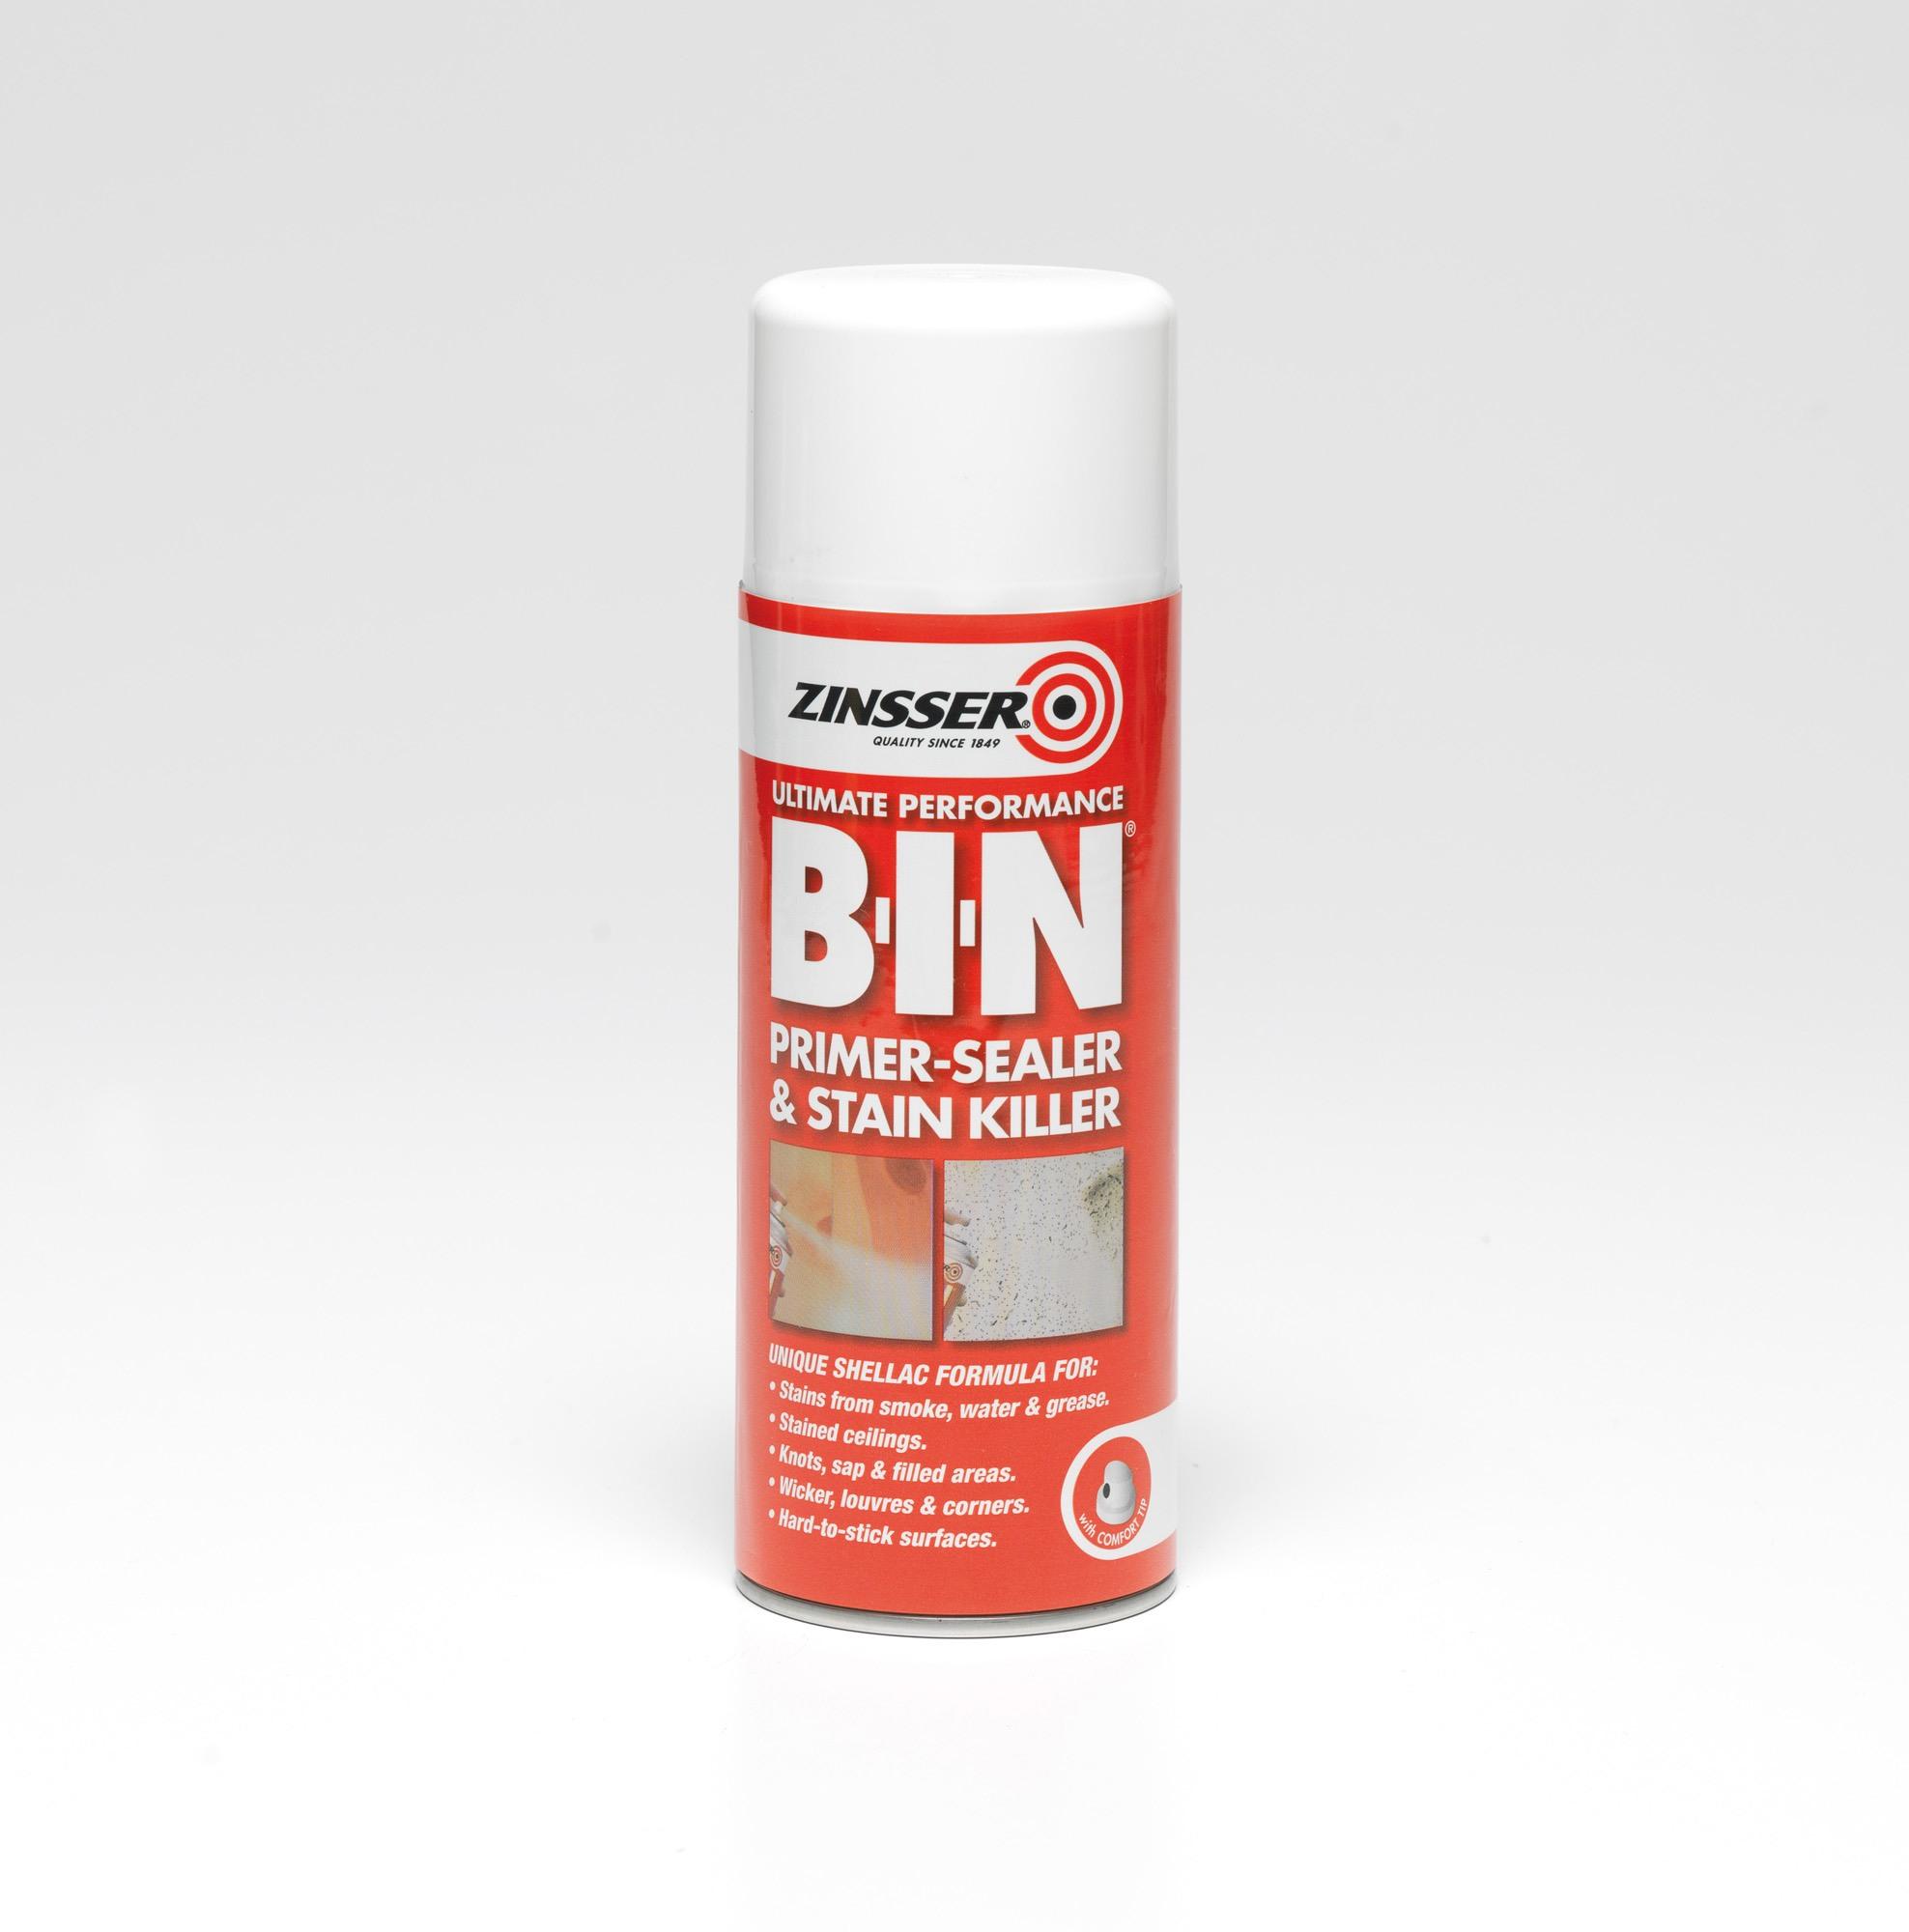 BIN aerosol